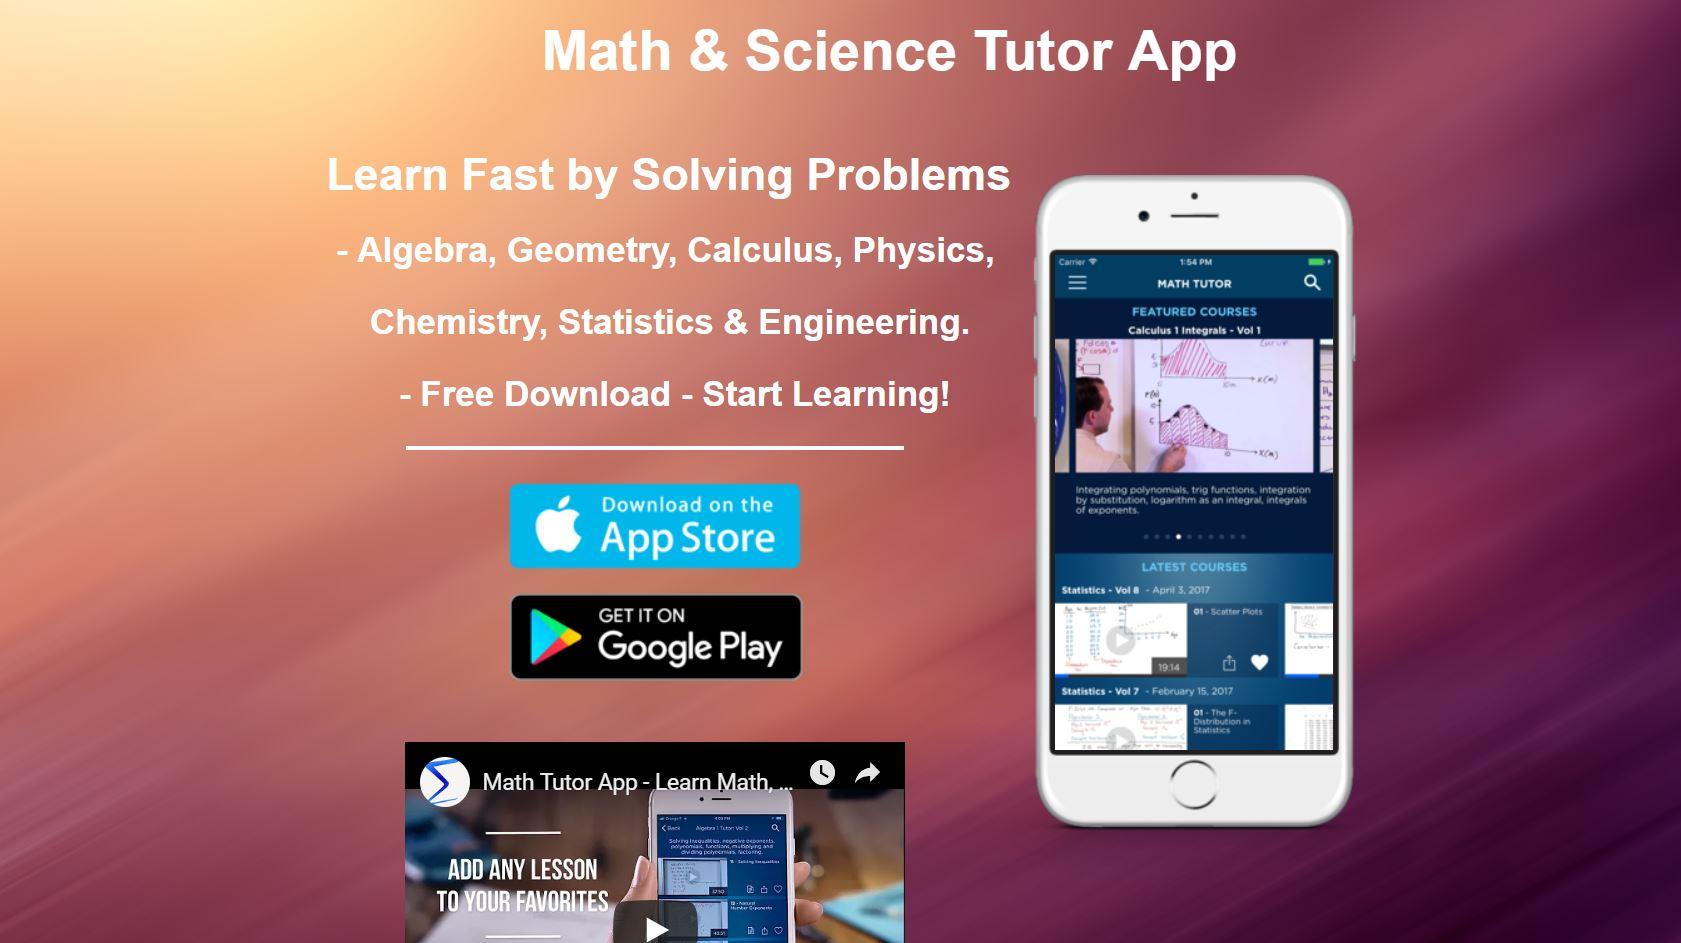 Math & Science Tutor App Codakid Top 21 Math Apps of 2019